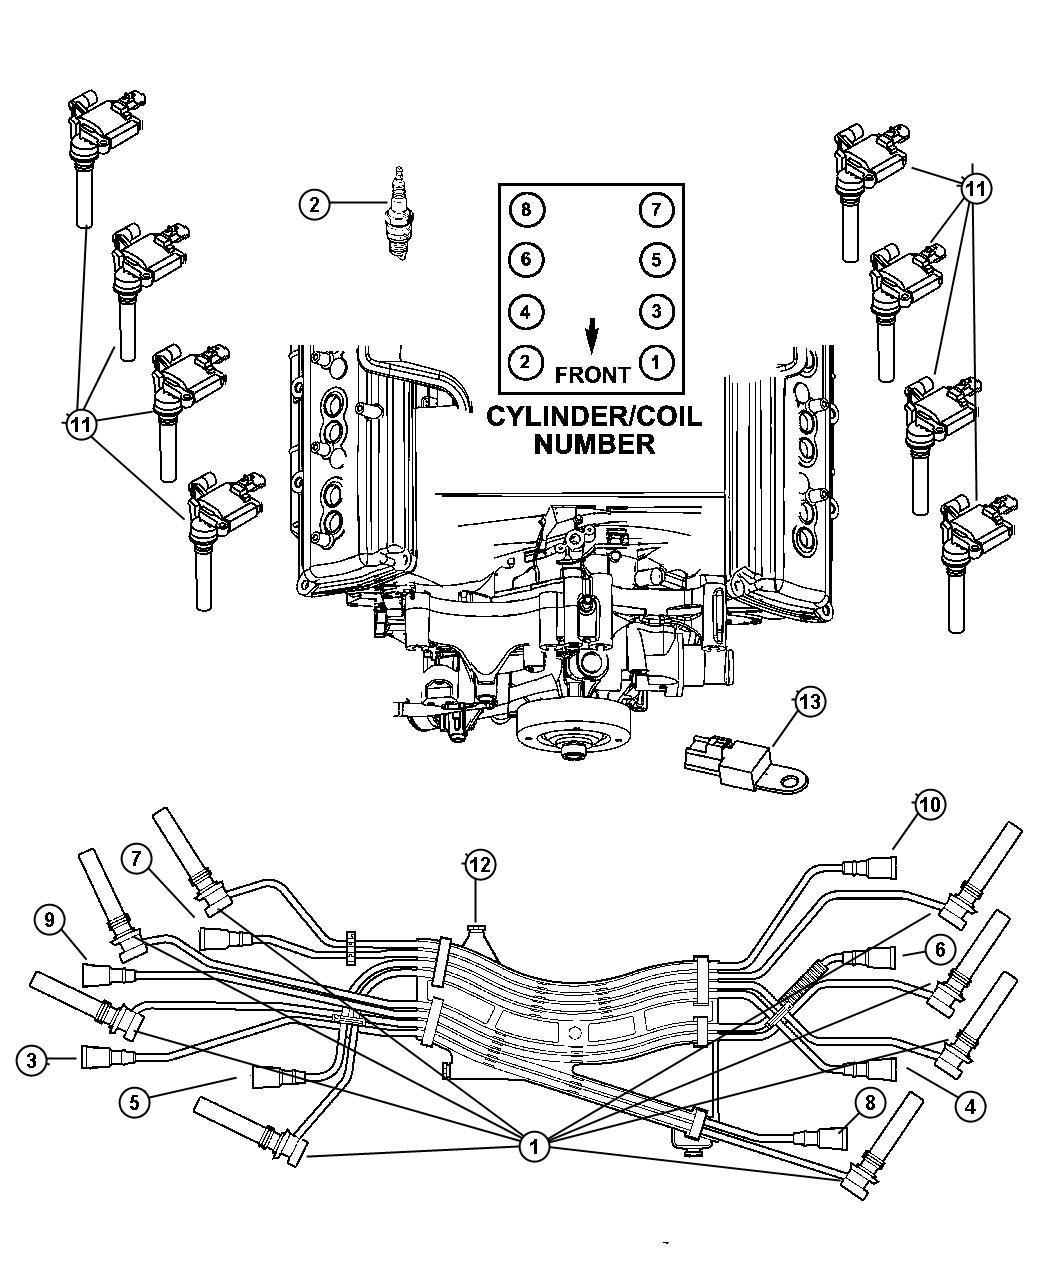 Diy Hemi Wirig 5.7 Dirgam 5 7 Hemi Engine Part Schematic Wiring Diagram Networks Of Diy Hemi Wirig 5.7 Dirgam